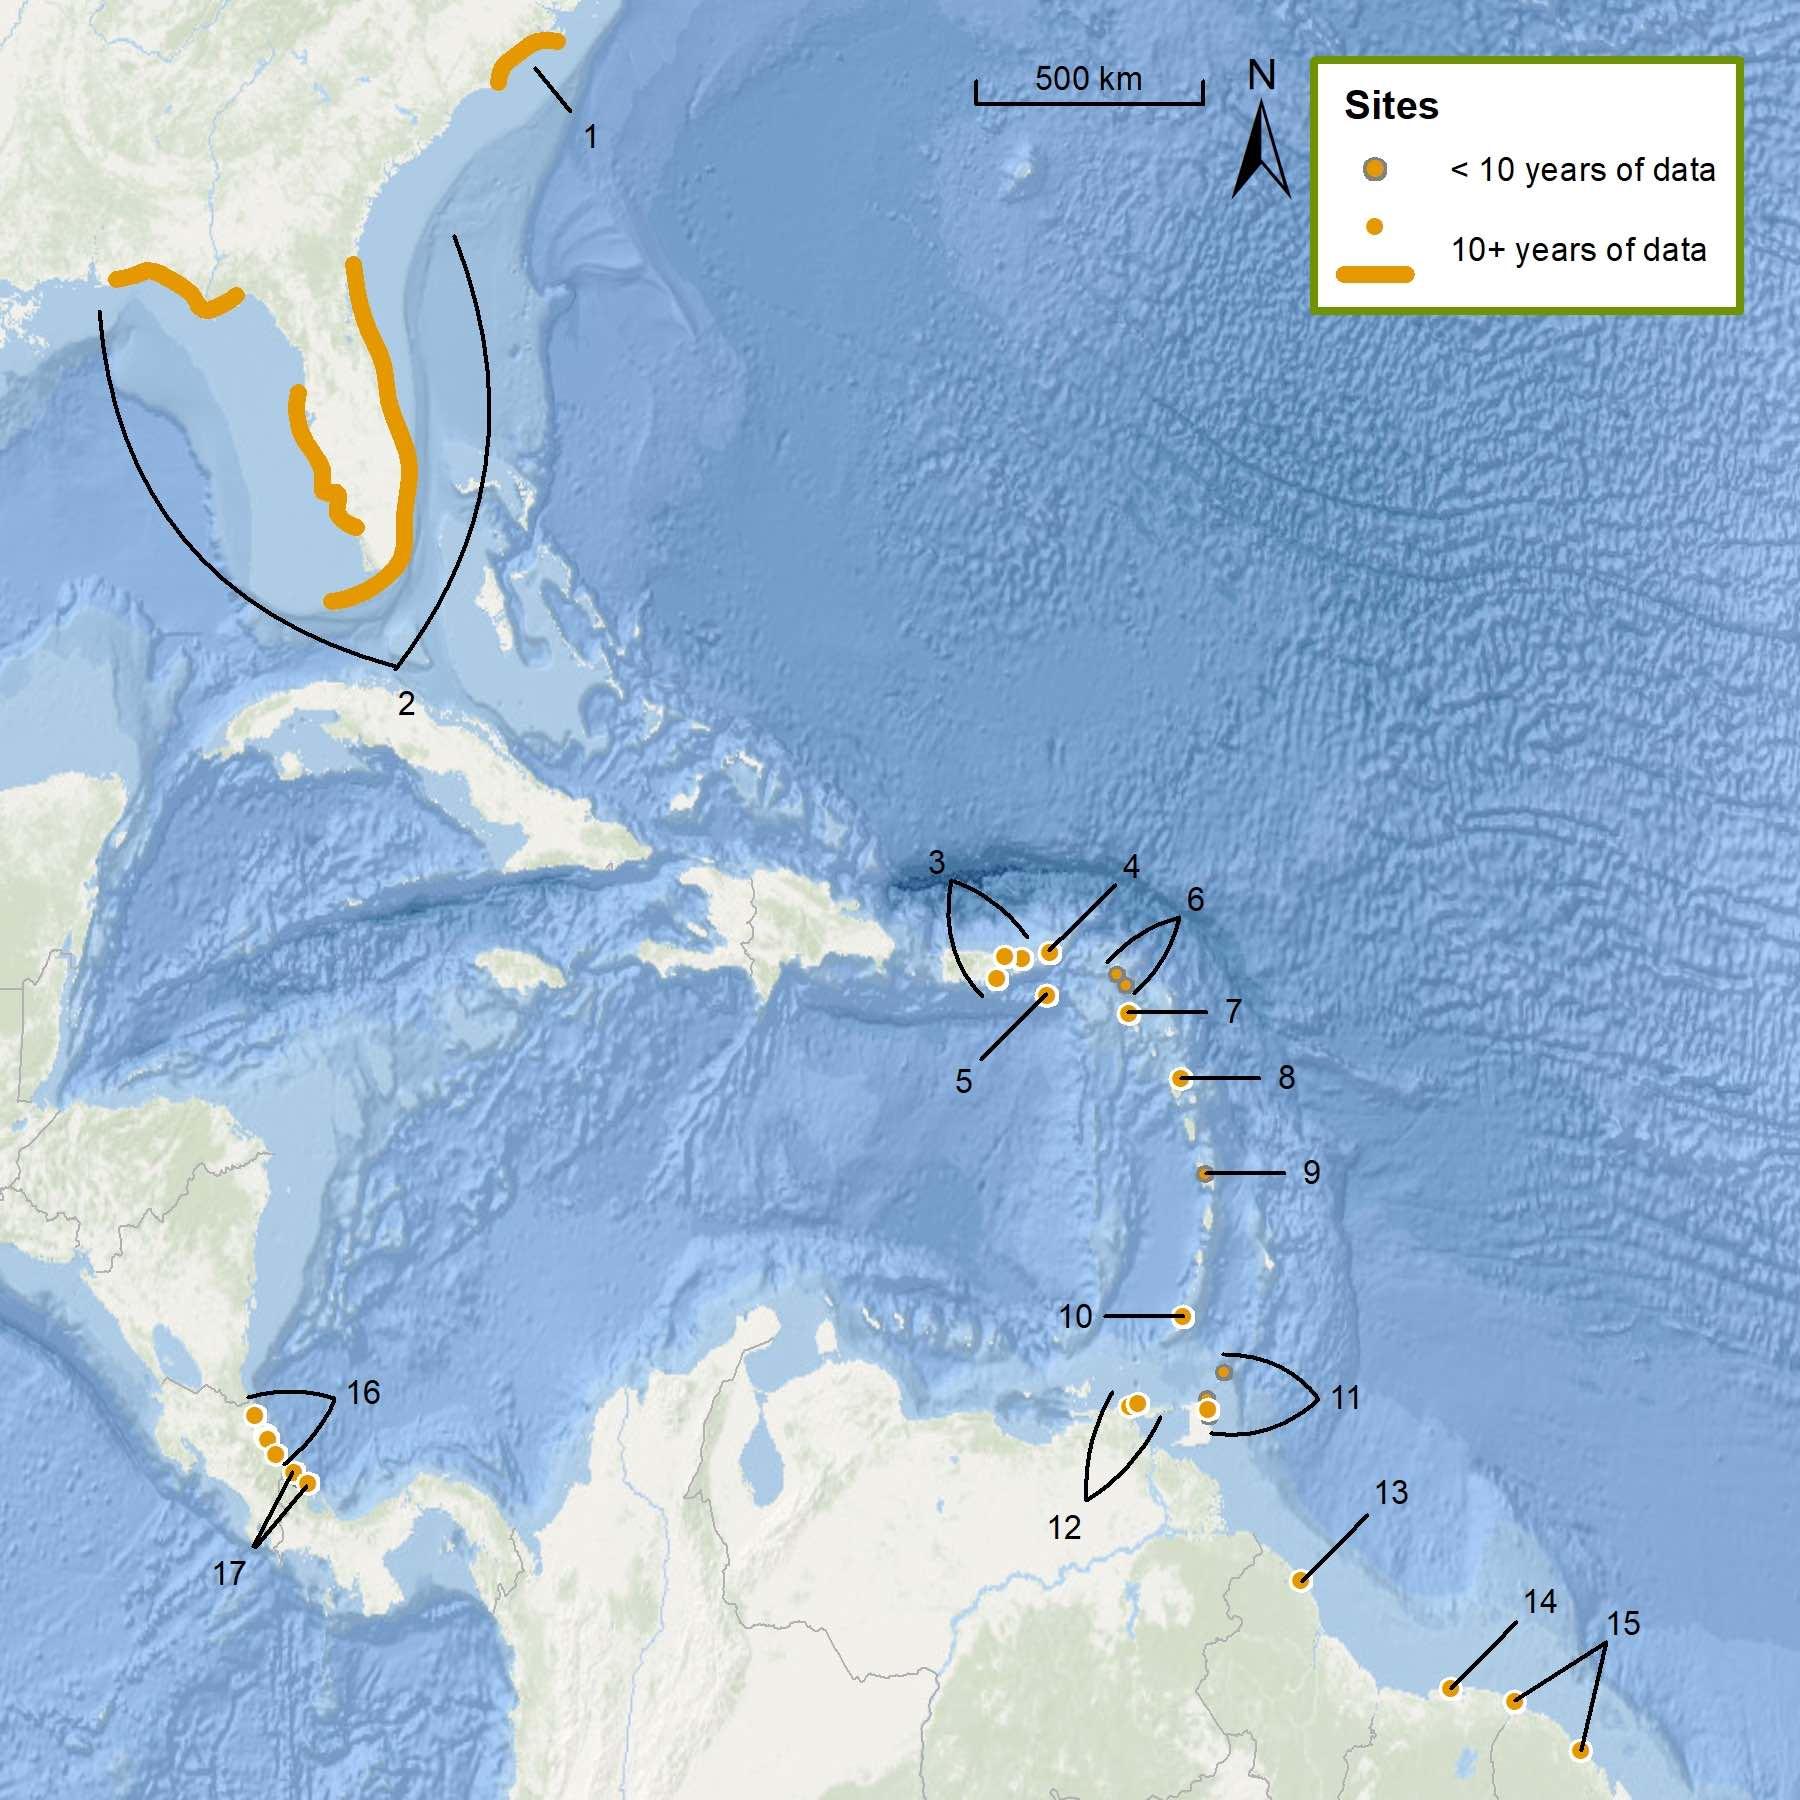 Northwest Atlantic Leatherback Assessment Sites: Assessment locations are (1) North Carolina, U.S.A. (highlighted coastline); (2) Florida, U.S.A. (highlighted coastline); (3) Culebra, Maunabo, and Luqillo-Fajardo, Puerto Rico, U.S.A.; (4) Tortola, BVI; (5) St. Croix, USVI; (6) St. Martin and St. Bathélemy; (7) St. Kitts and Nevis; (8) Guadeloupe; (9) Martinque; (10) Grenada; (11) Matura, Fishing Pond, Grand Riviere, and Tobago; Trinidad and Tobago; (12) Cipara and Querepare, Venezuela; (13) Guyana; (14) Suriname; (15) Awala-Yalimapo and Cayenne, French Guiana; (16) Pacuare, Mondonguillo, Estacion Las Torgugas, Tortuguero, Cahuita, and Gandoca, Costa Rica; (17) Chiriqui and Soropta, Panama.